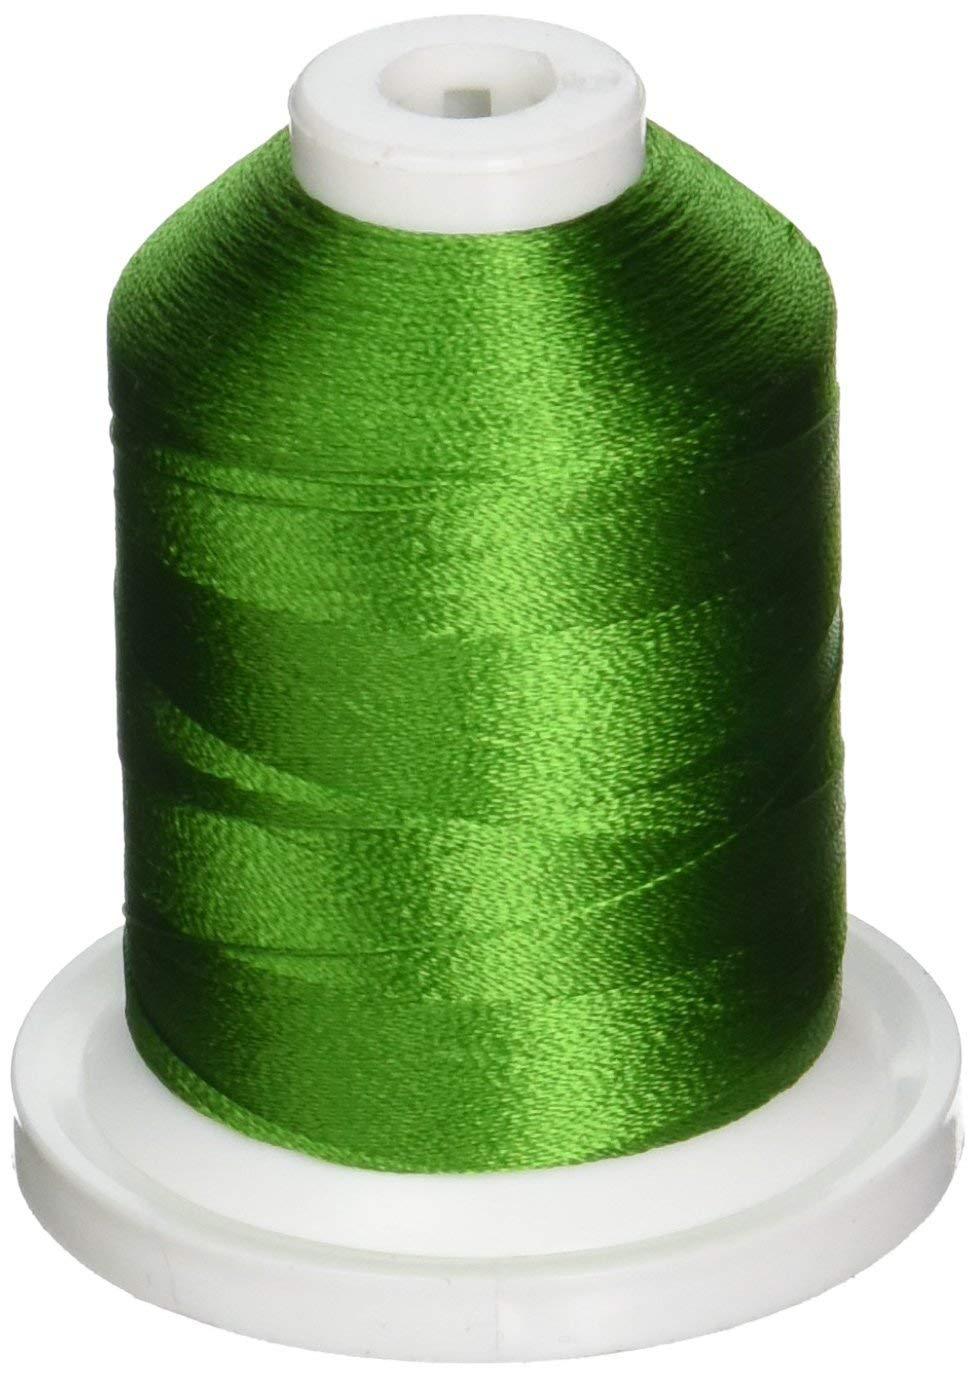 Robison-Anton Rayon Super Strength Thread, 1100-Yard, Pro-Erin